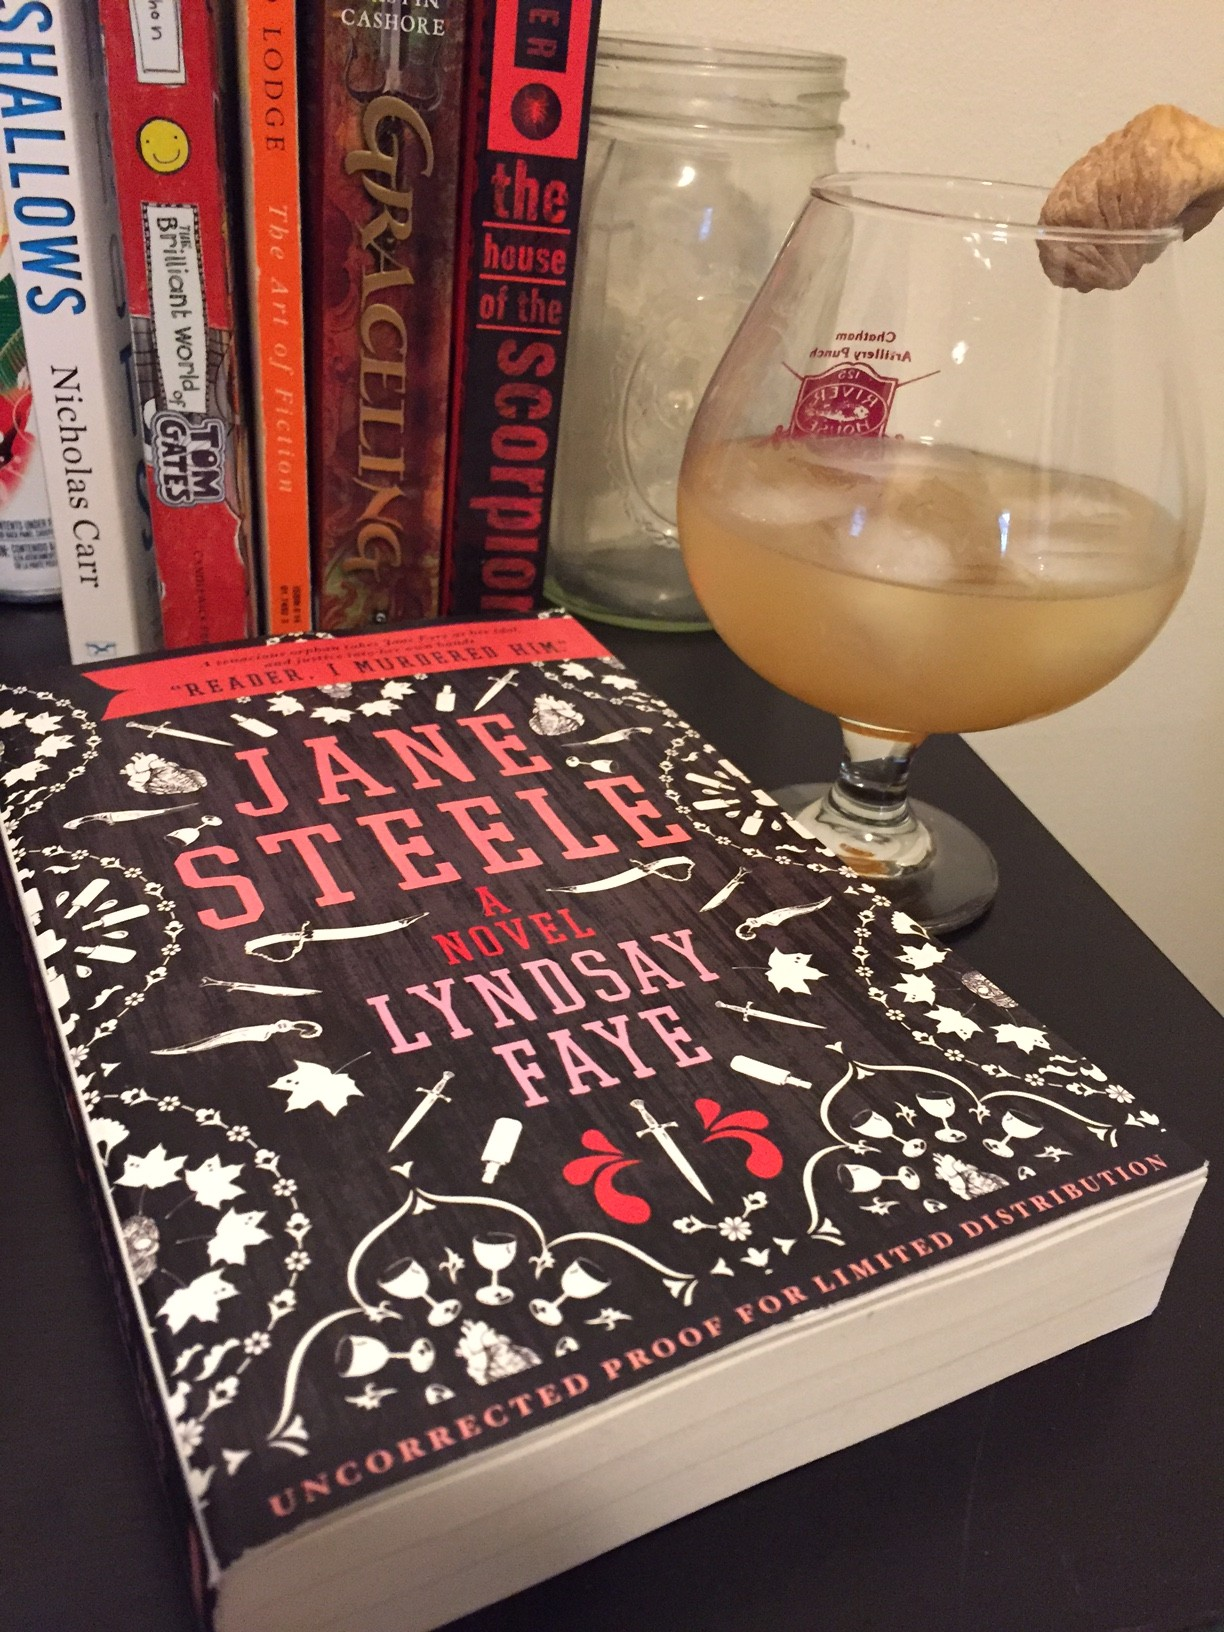 A copy of Jane Steele by Lyndsay Faye with The Jane Steele drink